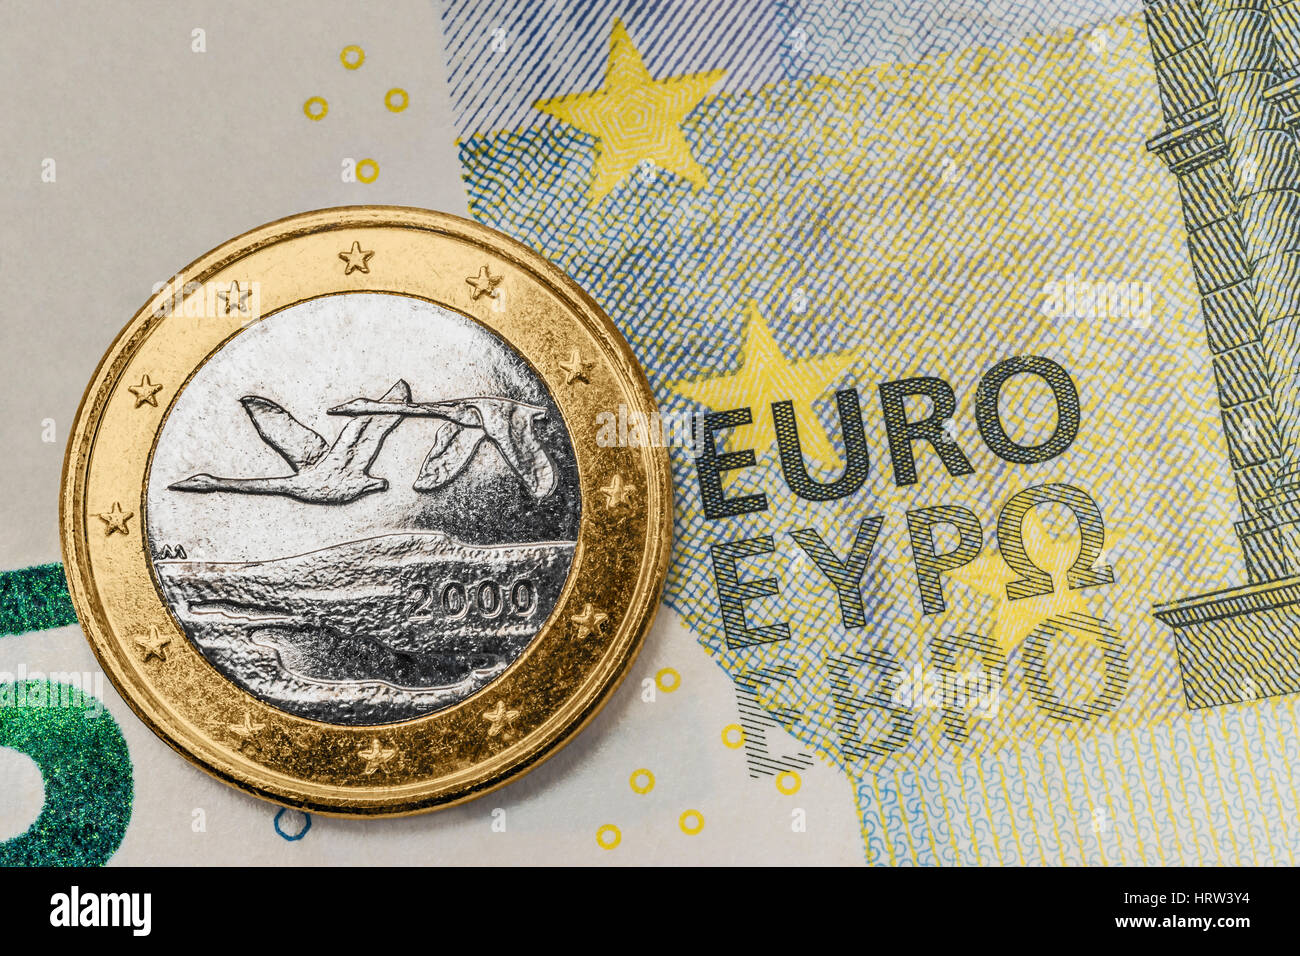 Une Pièce De 1 Euro De Finlande Sur Un Billet De 5 Euros Banque D